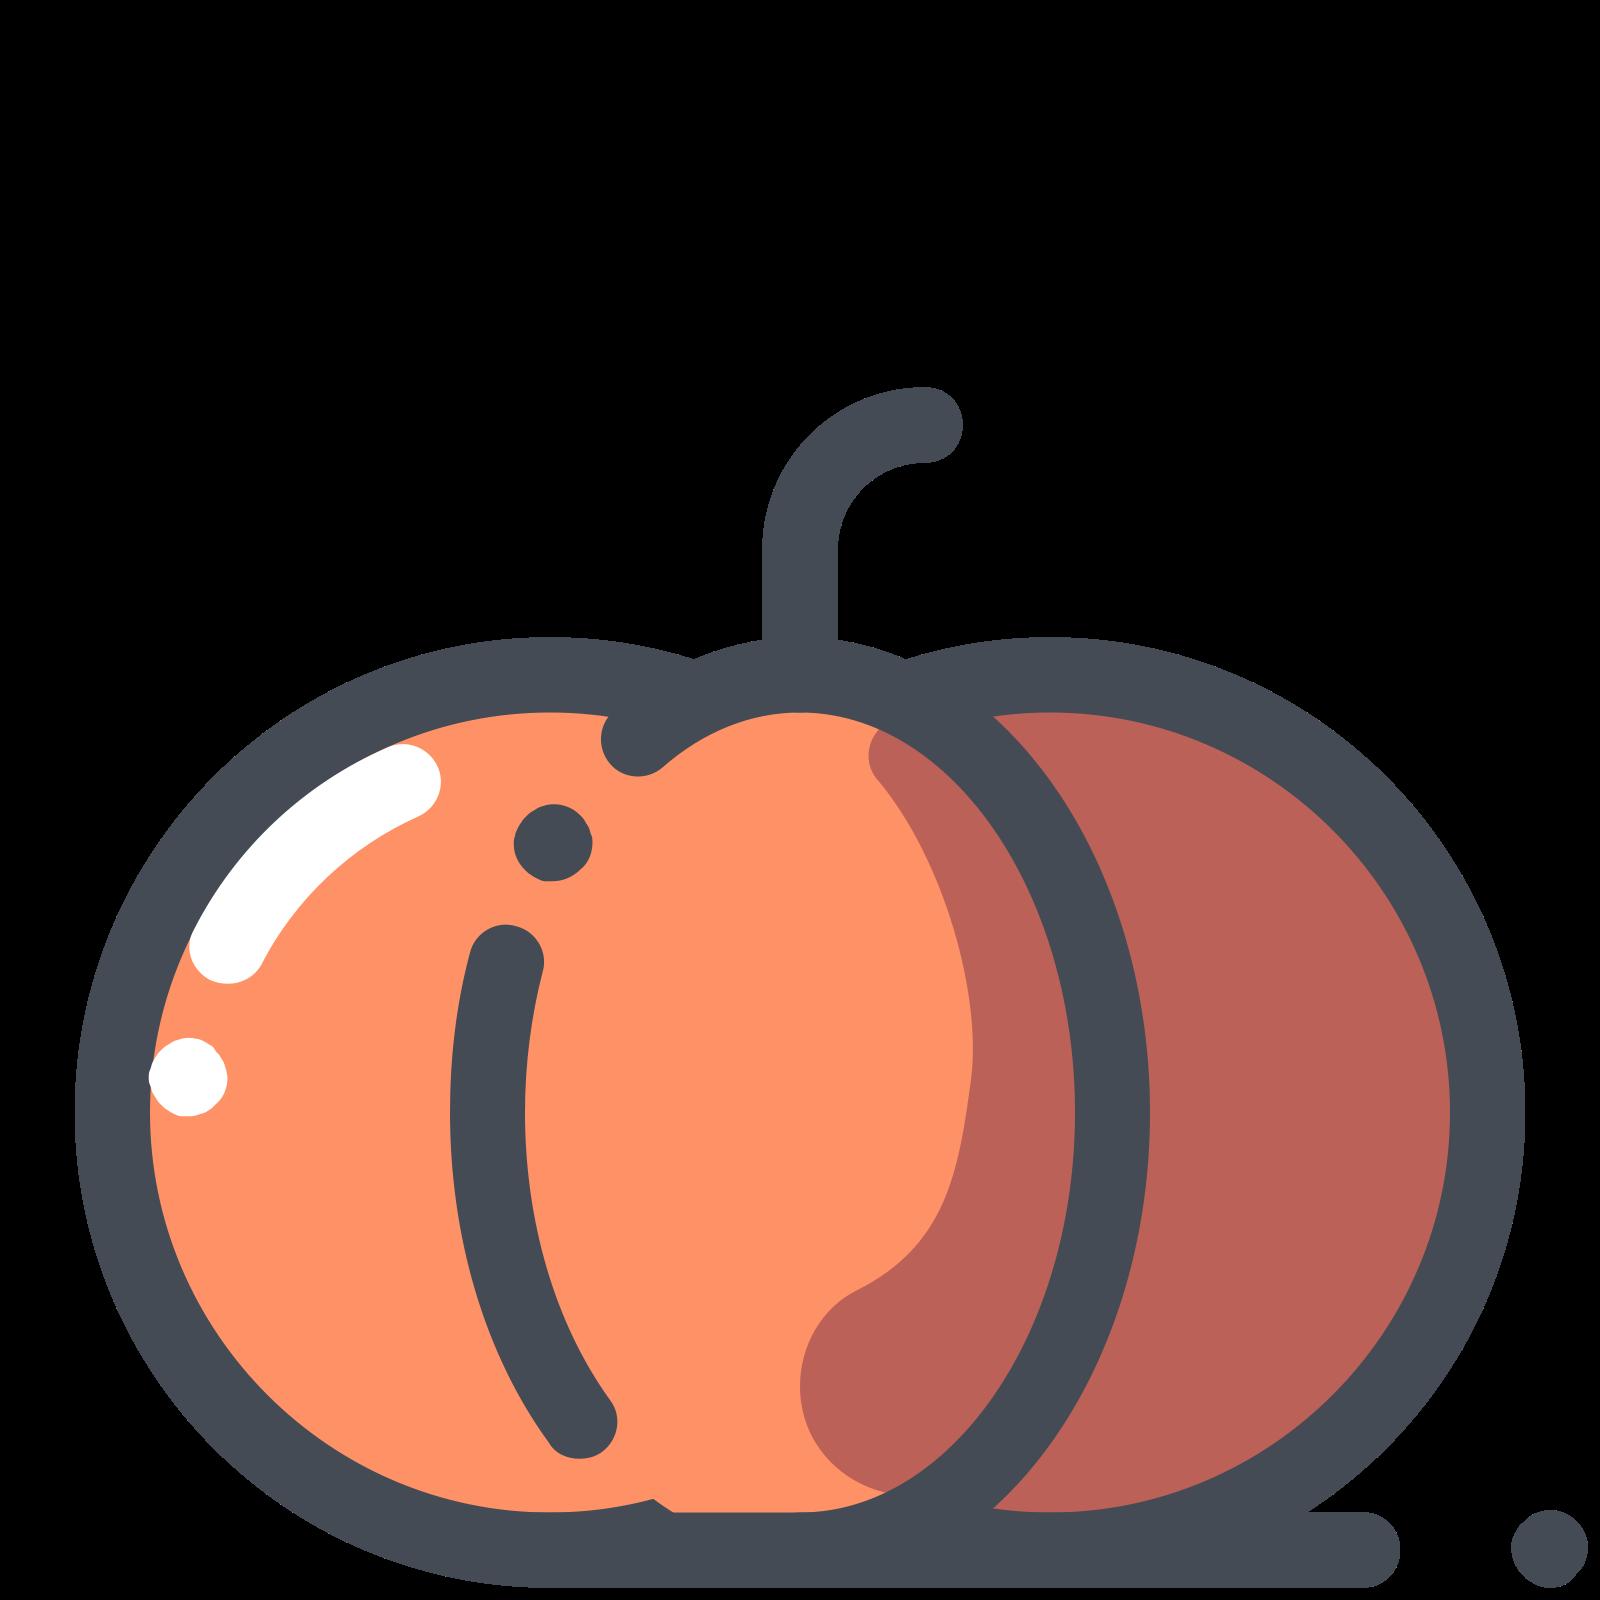 Pumpkin Vegetable Icon Halloween Icons Graphicdesign Illustration Pumpkin Illustration Halloween Icons App Icon